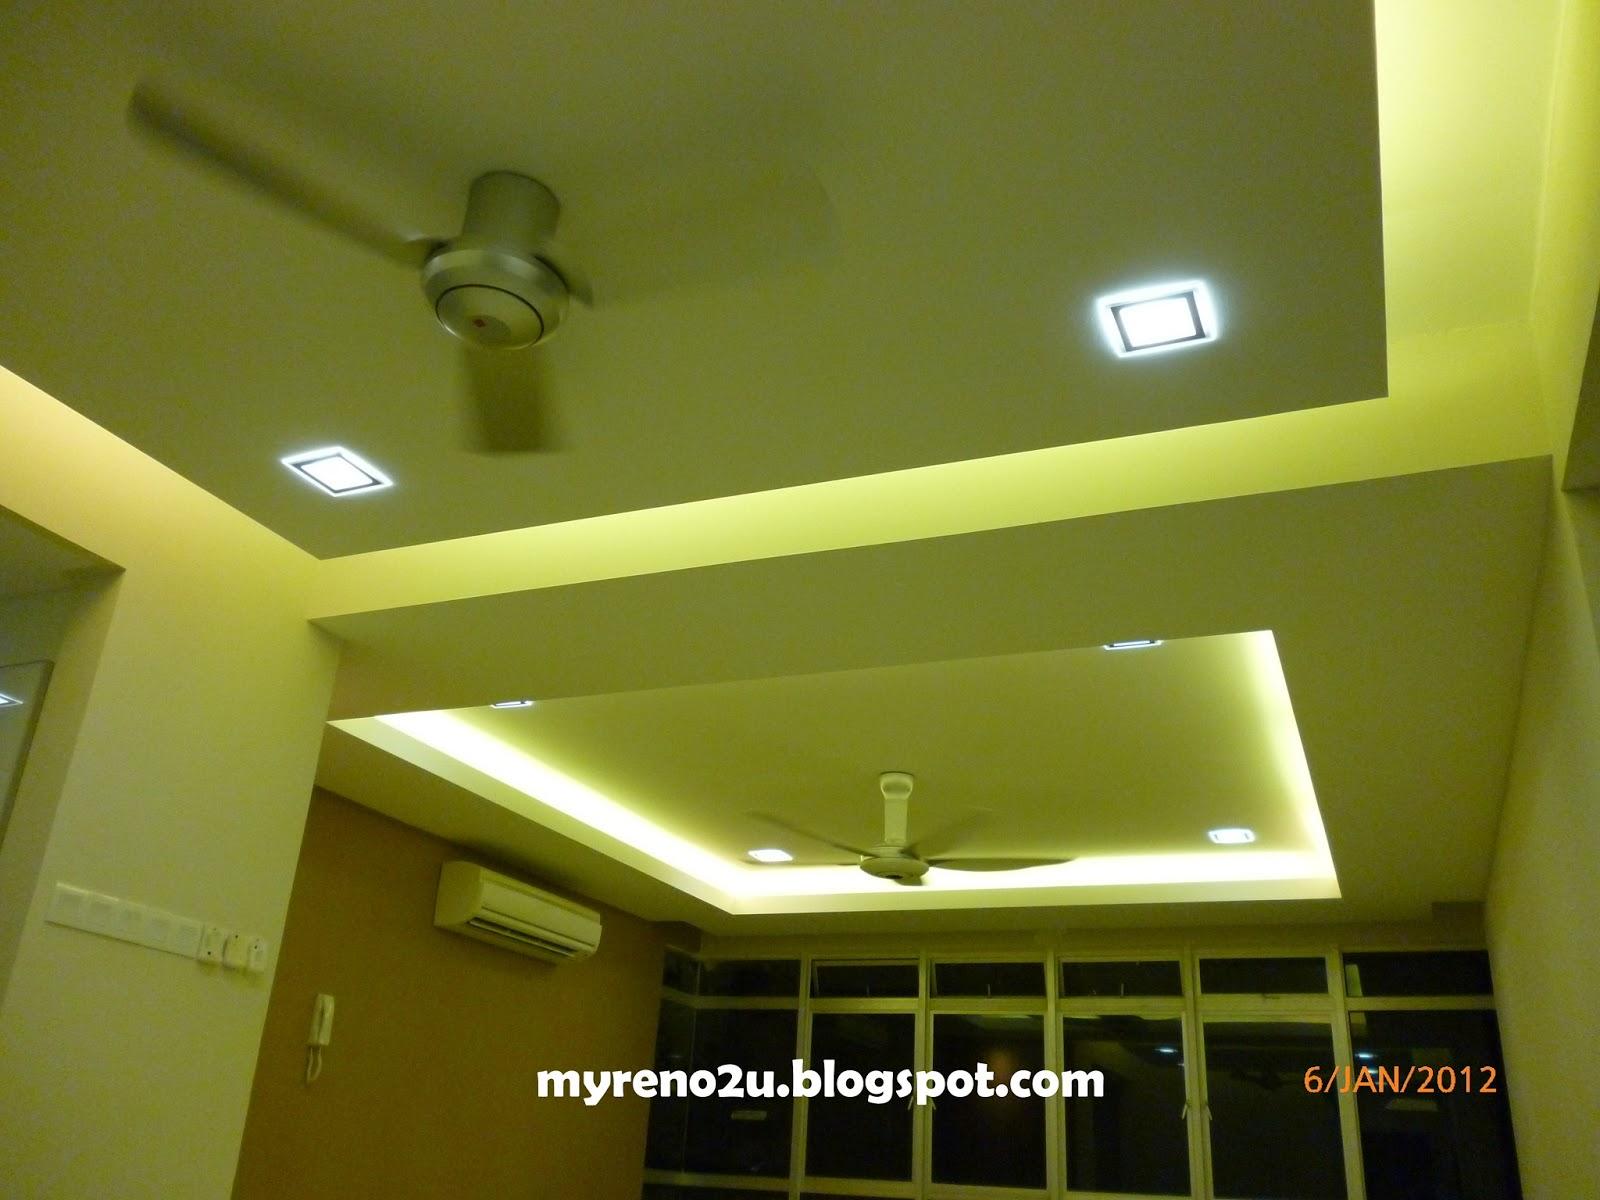 Plaster ceiling design shah alam myreno2u for Plaster ceiling design price